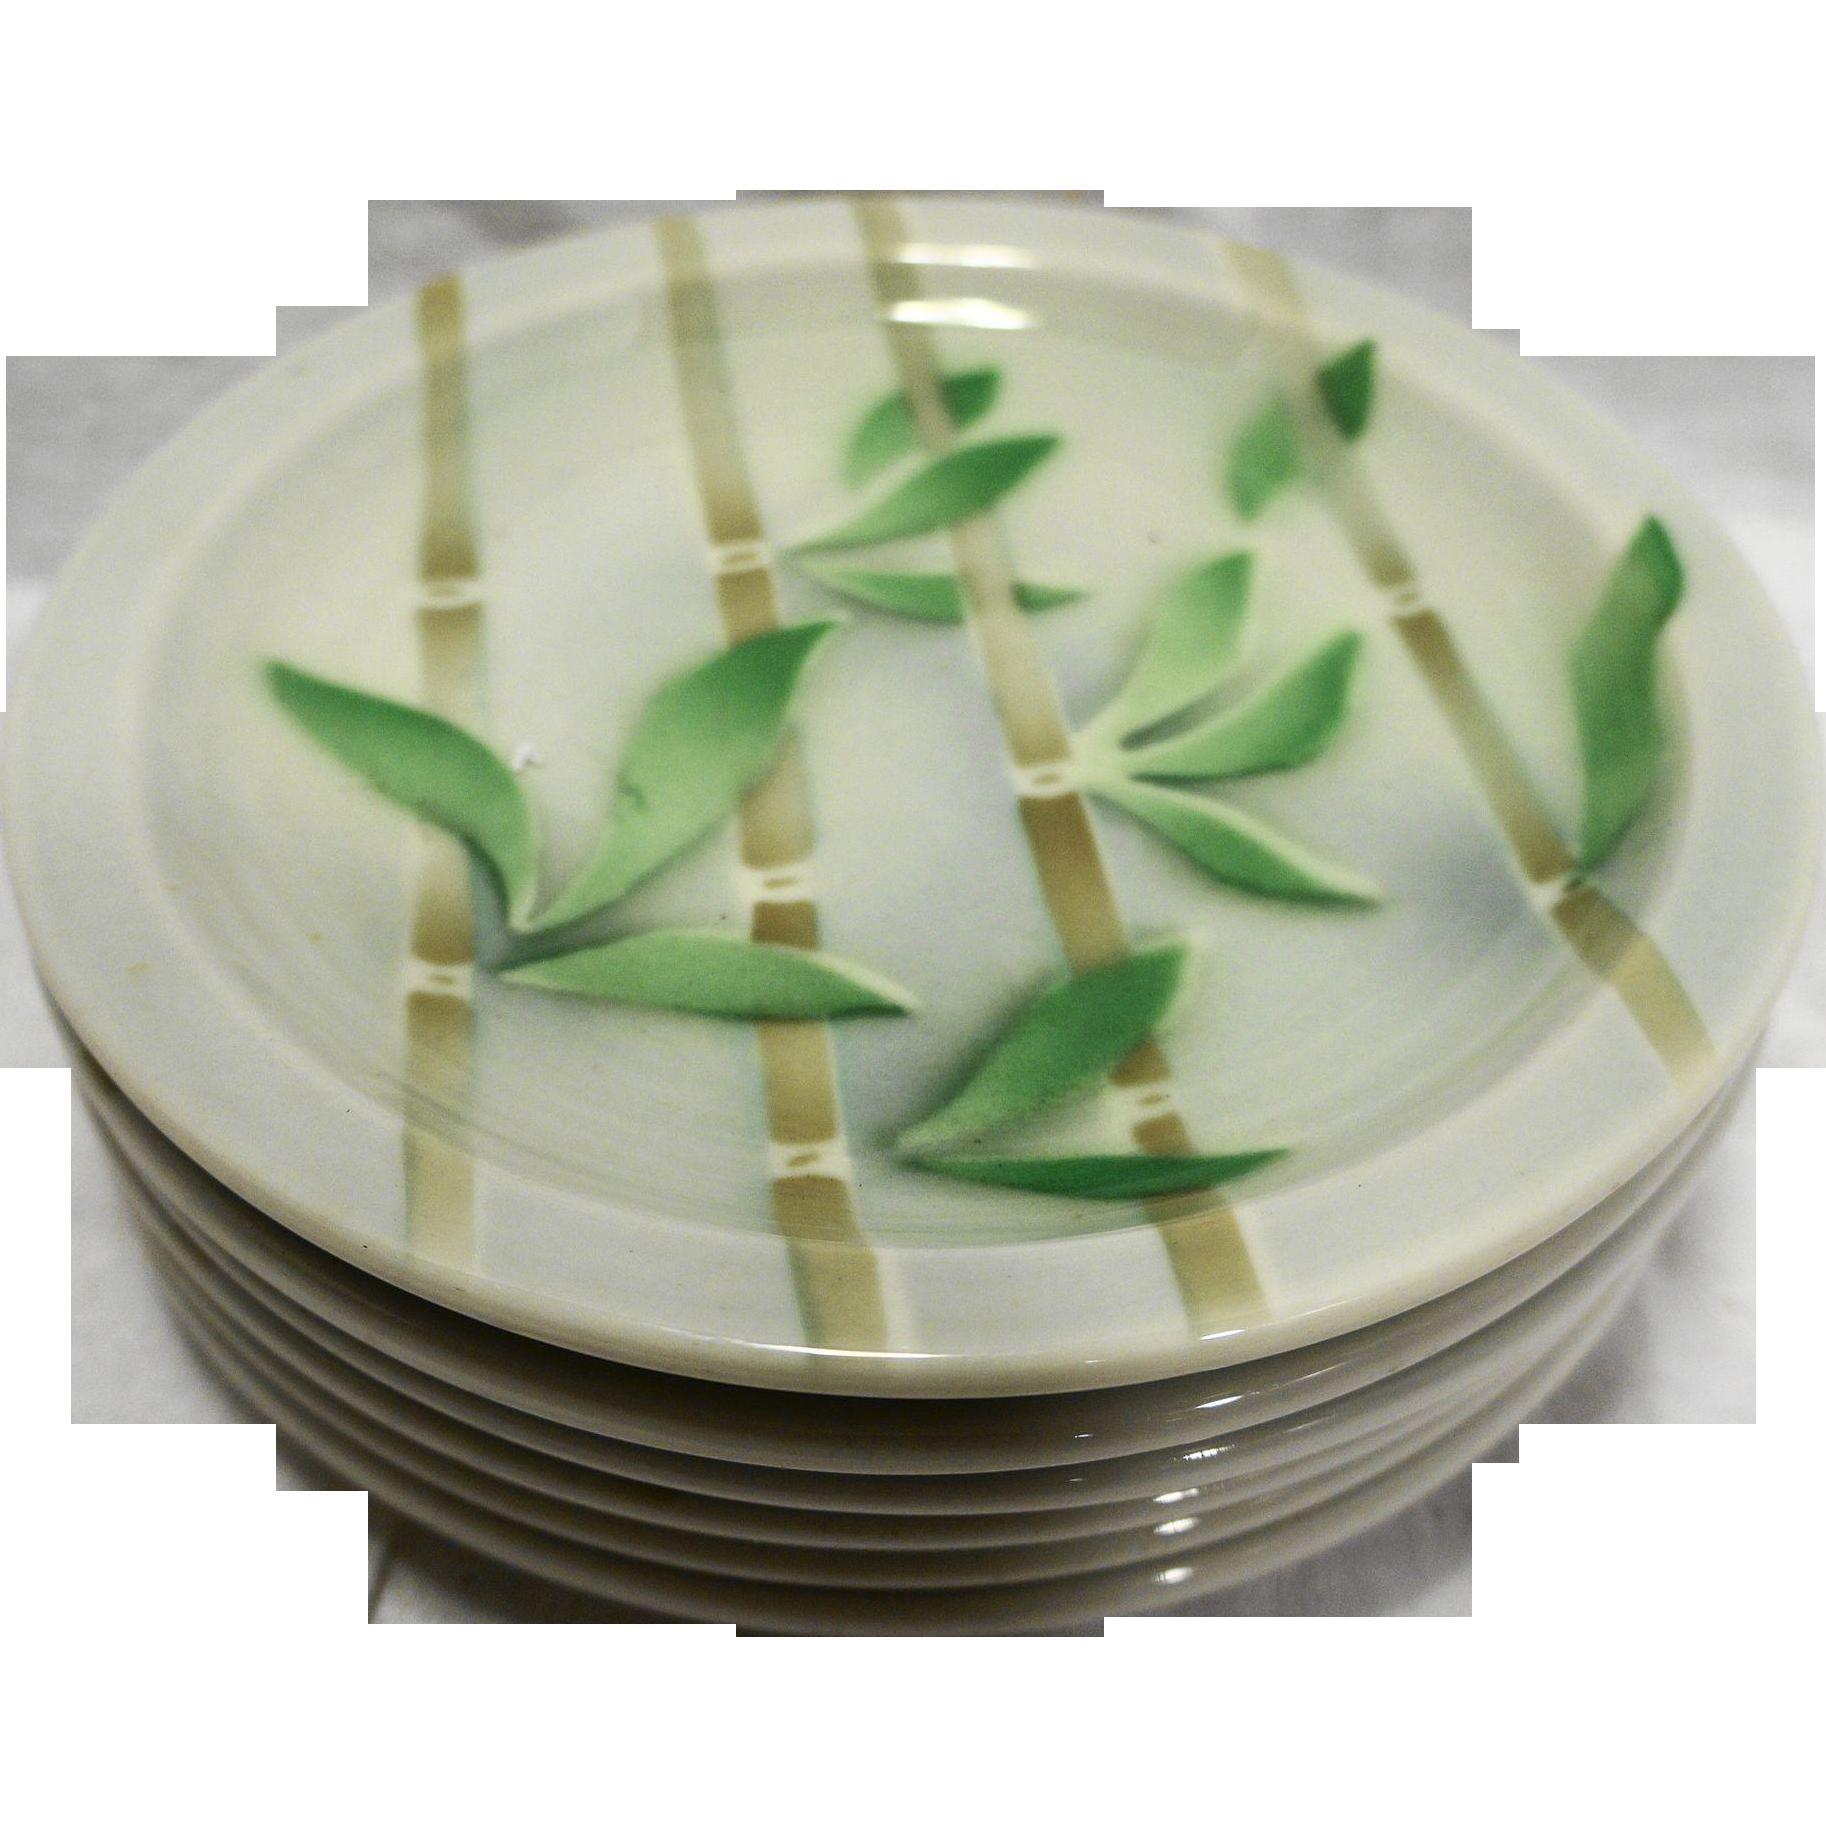 Syracuse Bamboo Bread Plates Restaurant Ware Set of 6